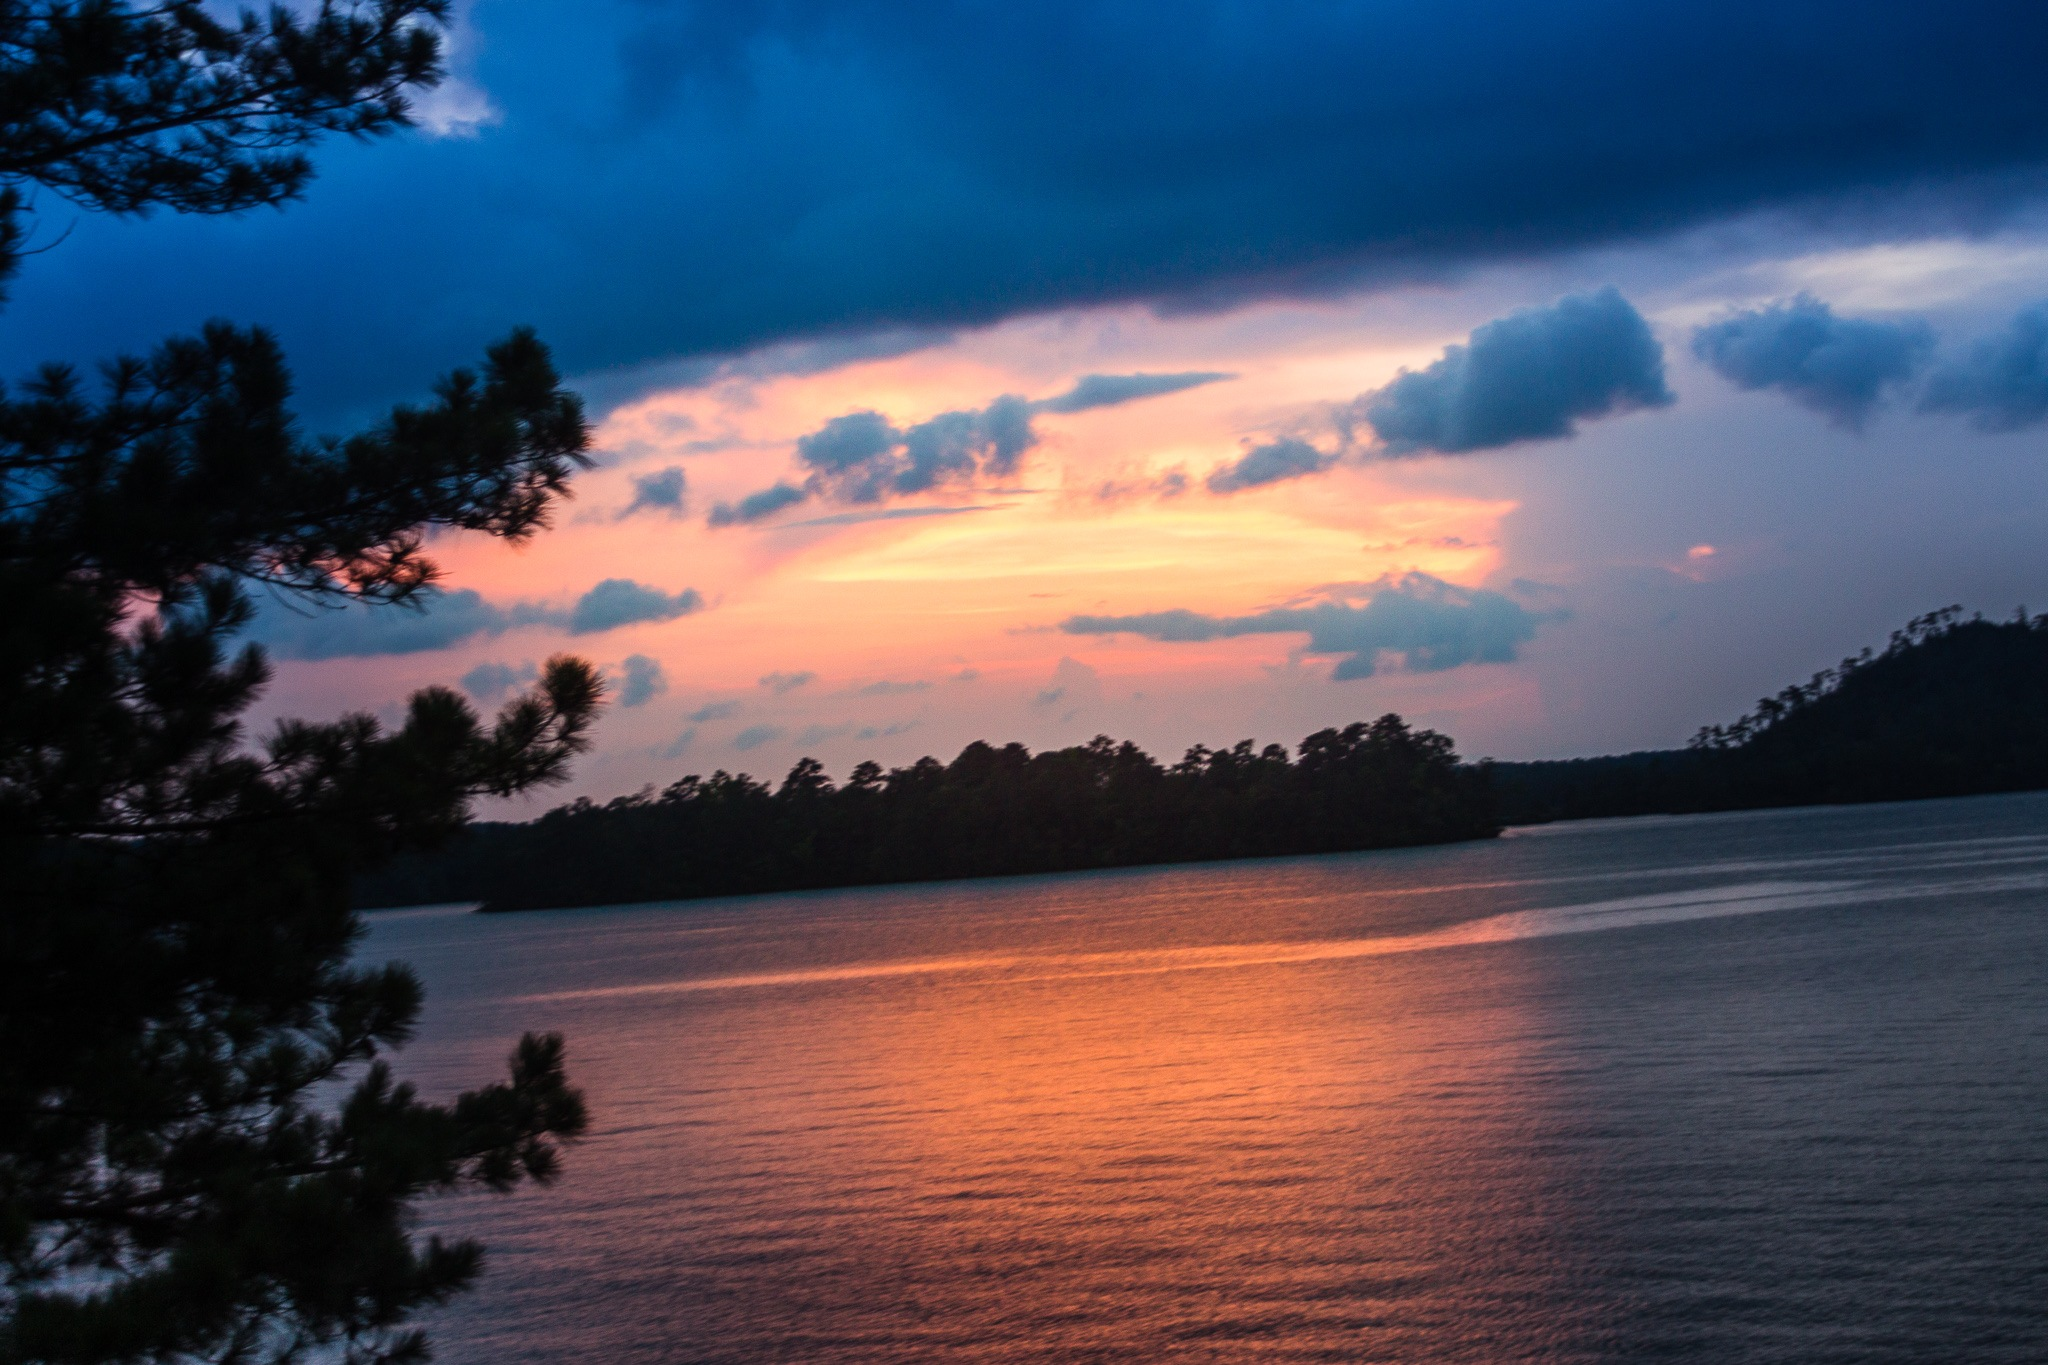 Lake Martin by RJR